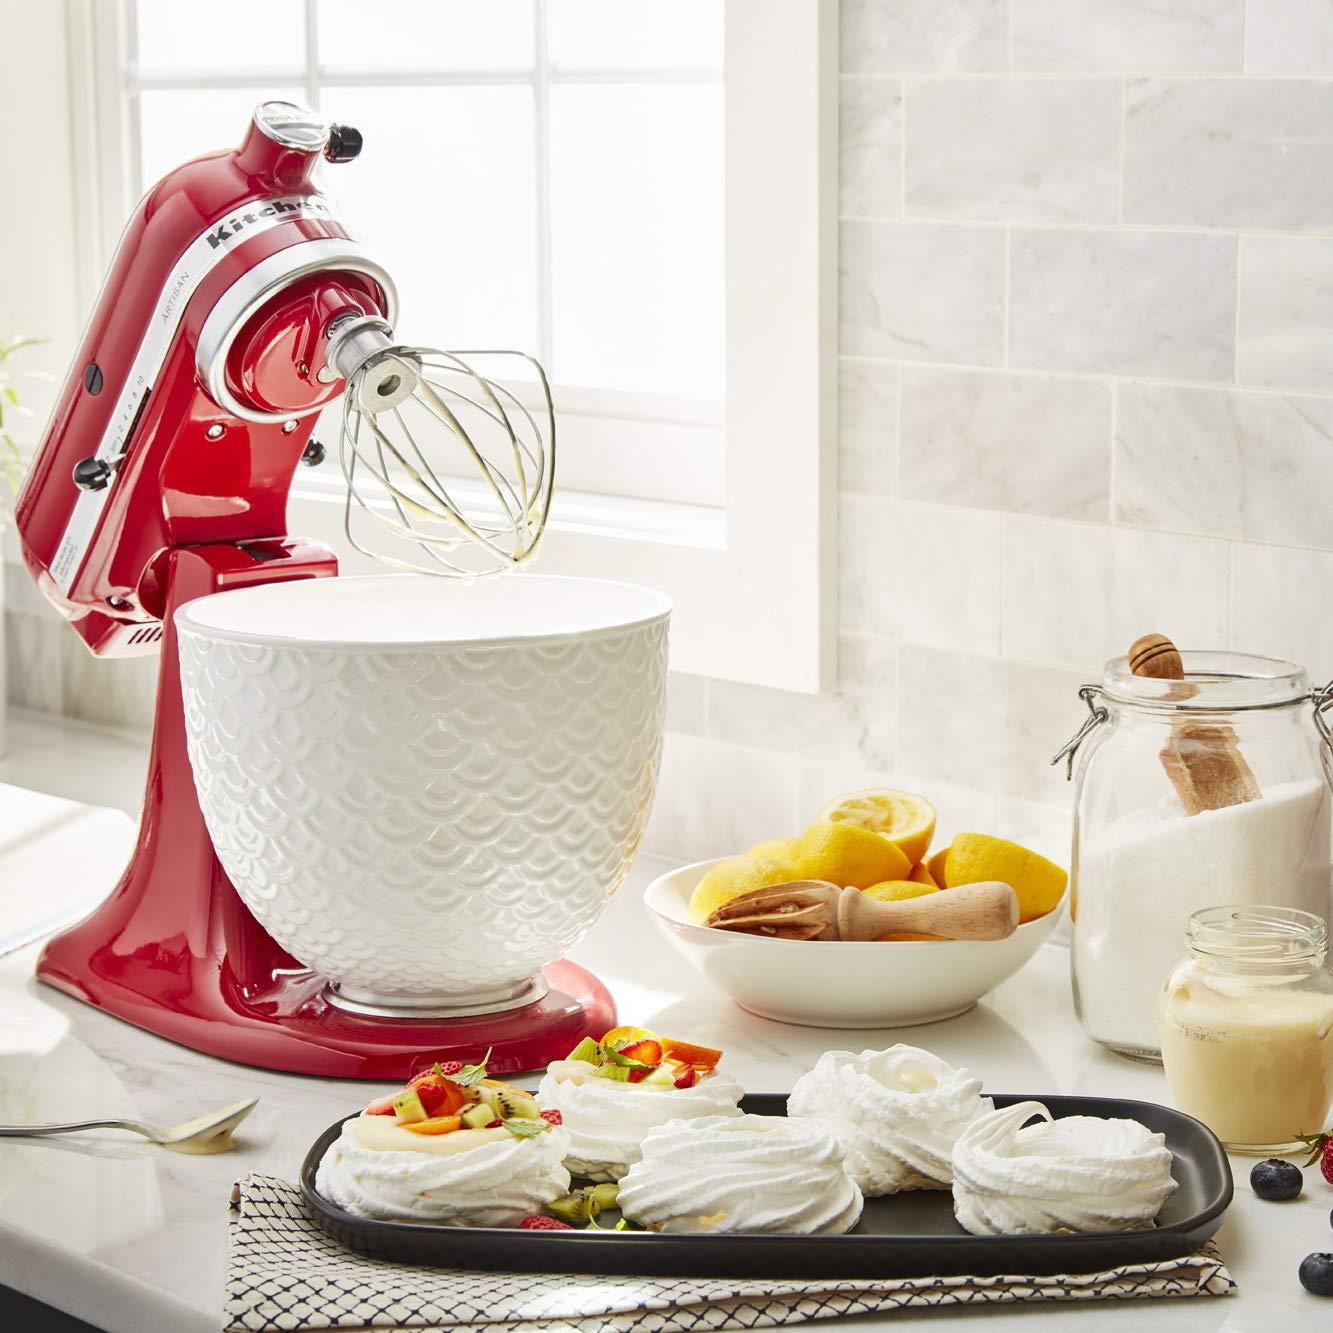 Kitcheniad Mixer Accessories